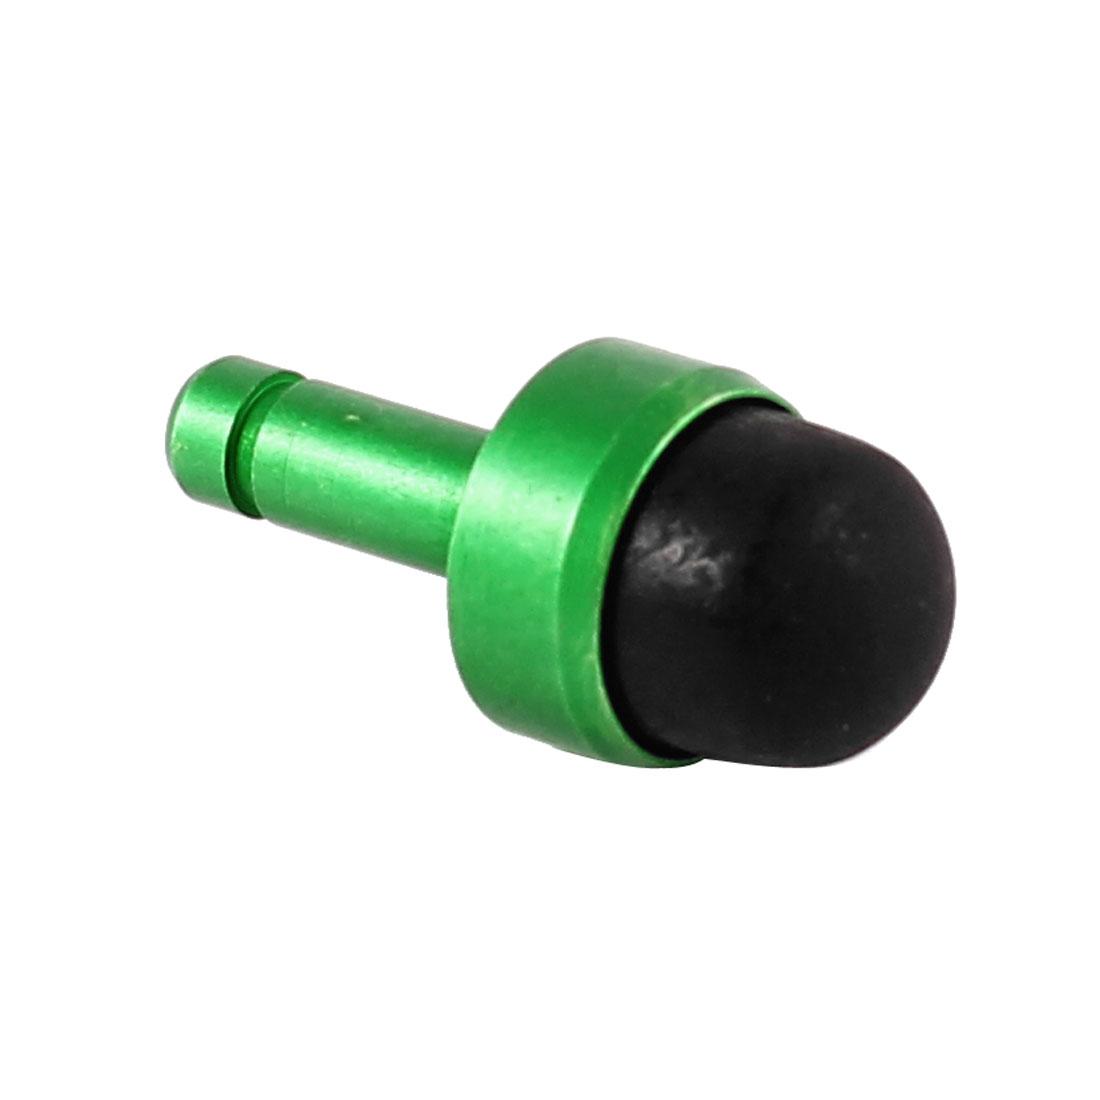 Mini Stylus Touch Screen Pen Anti Dust Headset Earphone Stopper Jack Ear Cap Green Black for Cell Phone